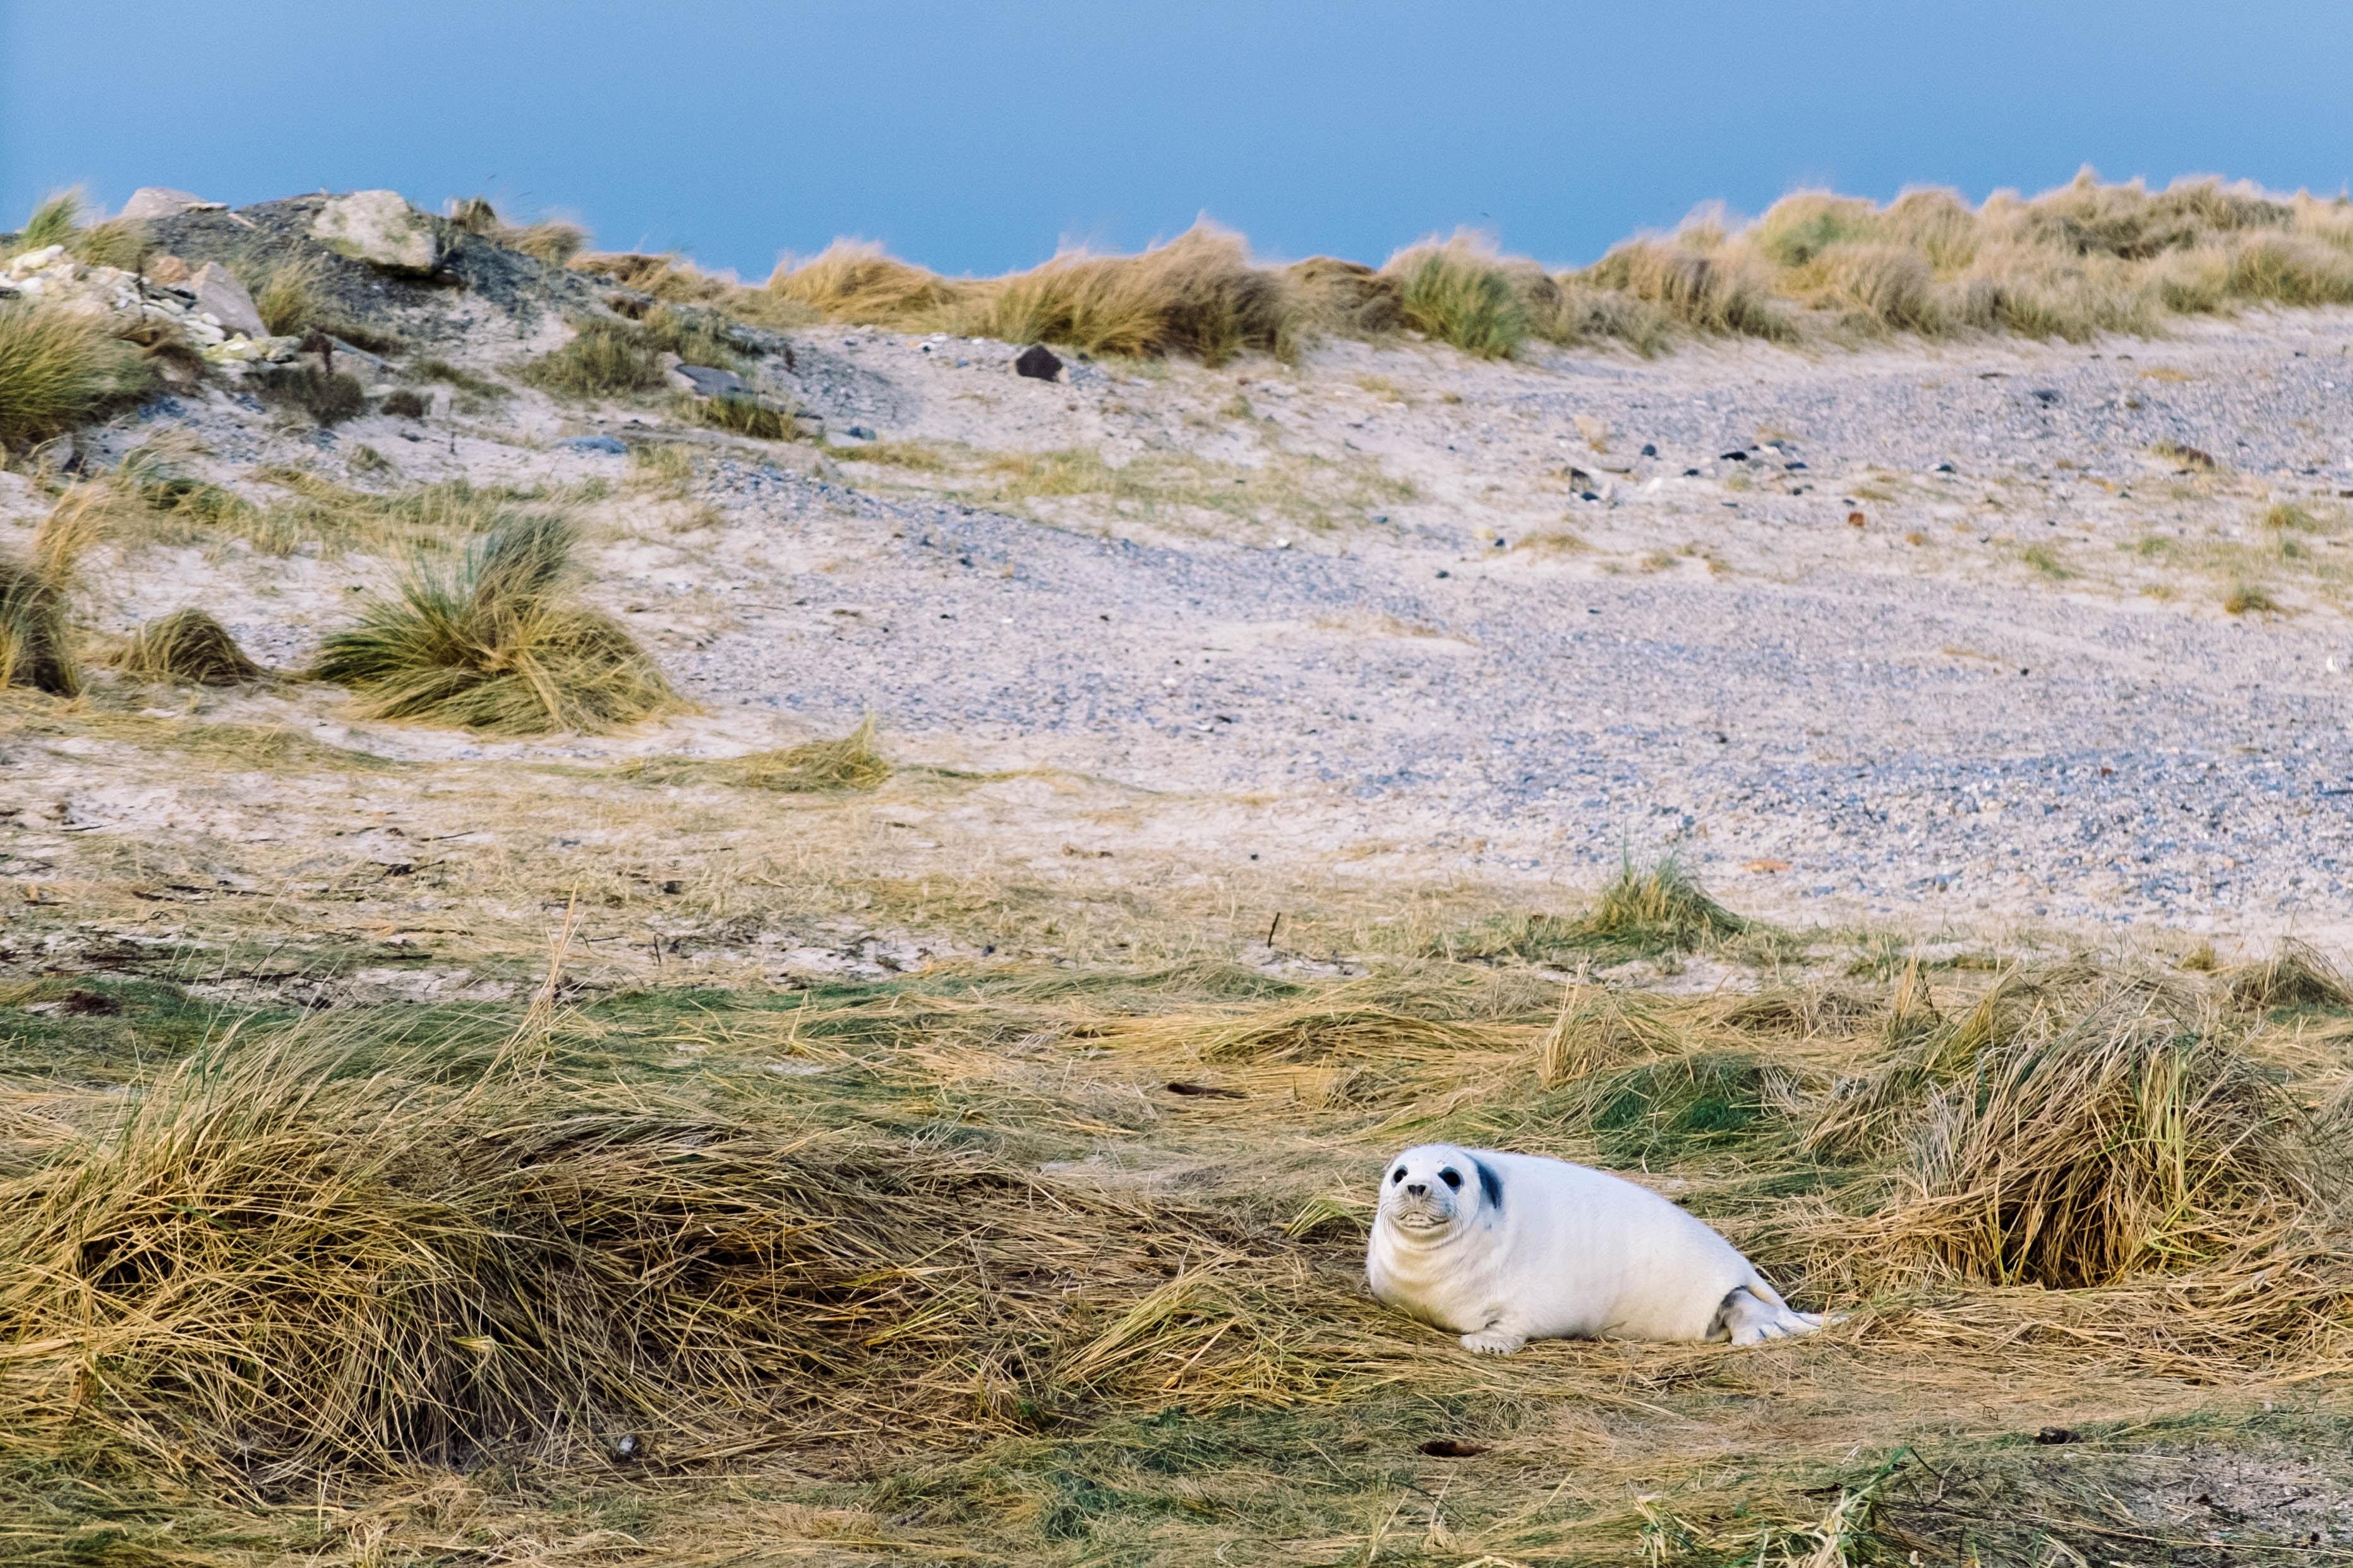 White sea lion pup in dune grass near beach in daytime, Heligoland